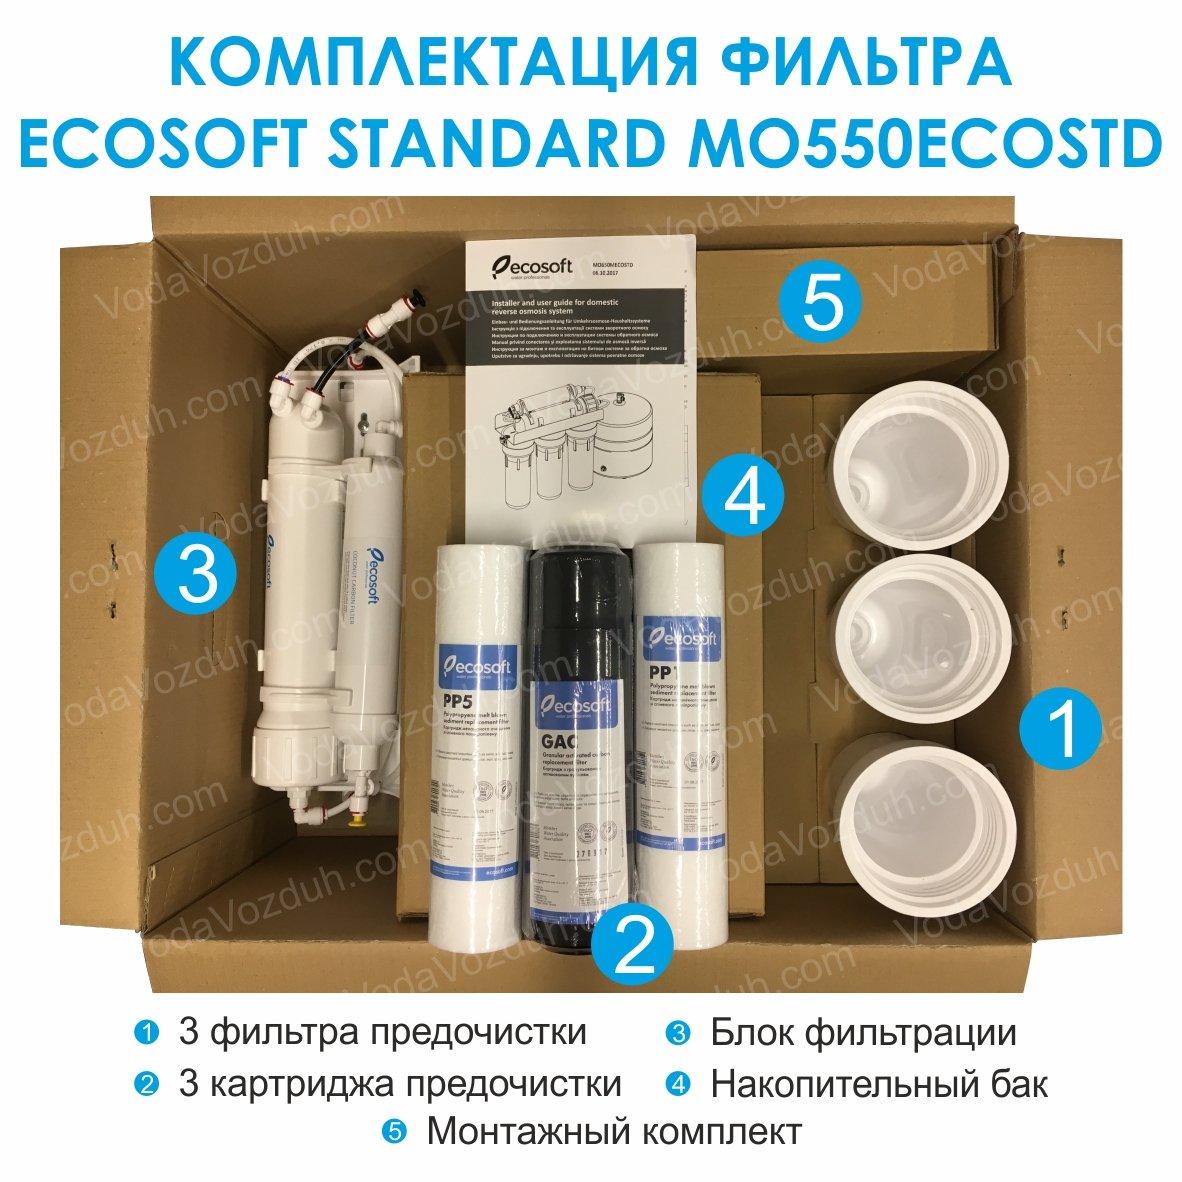 Ecosoft Standard5-50 MO550ECOSTD комплектация